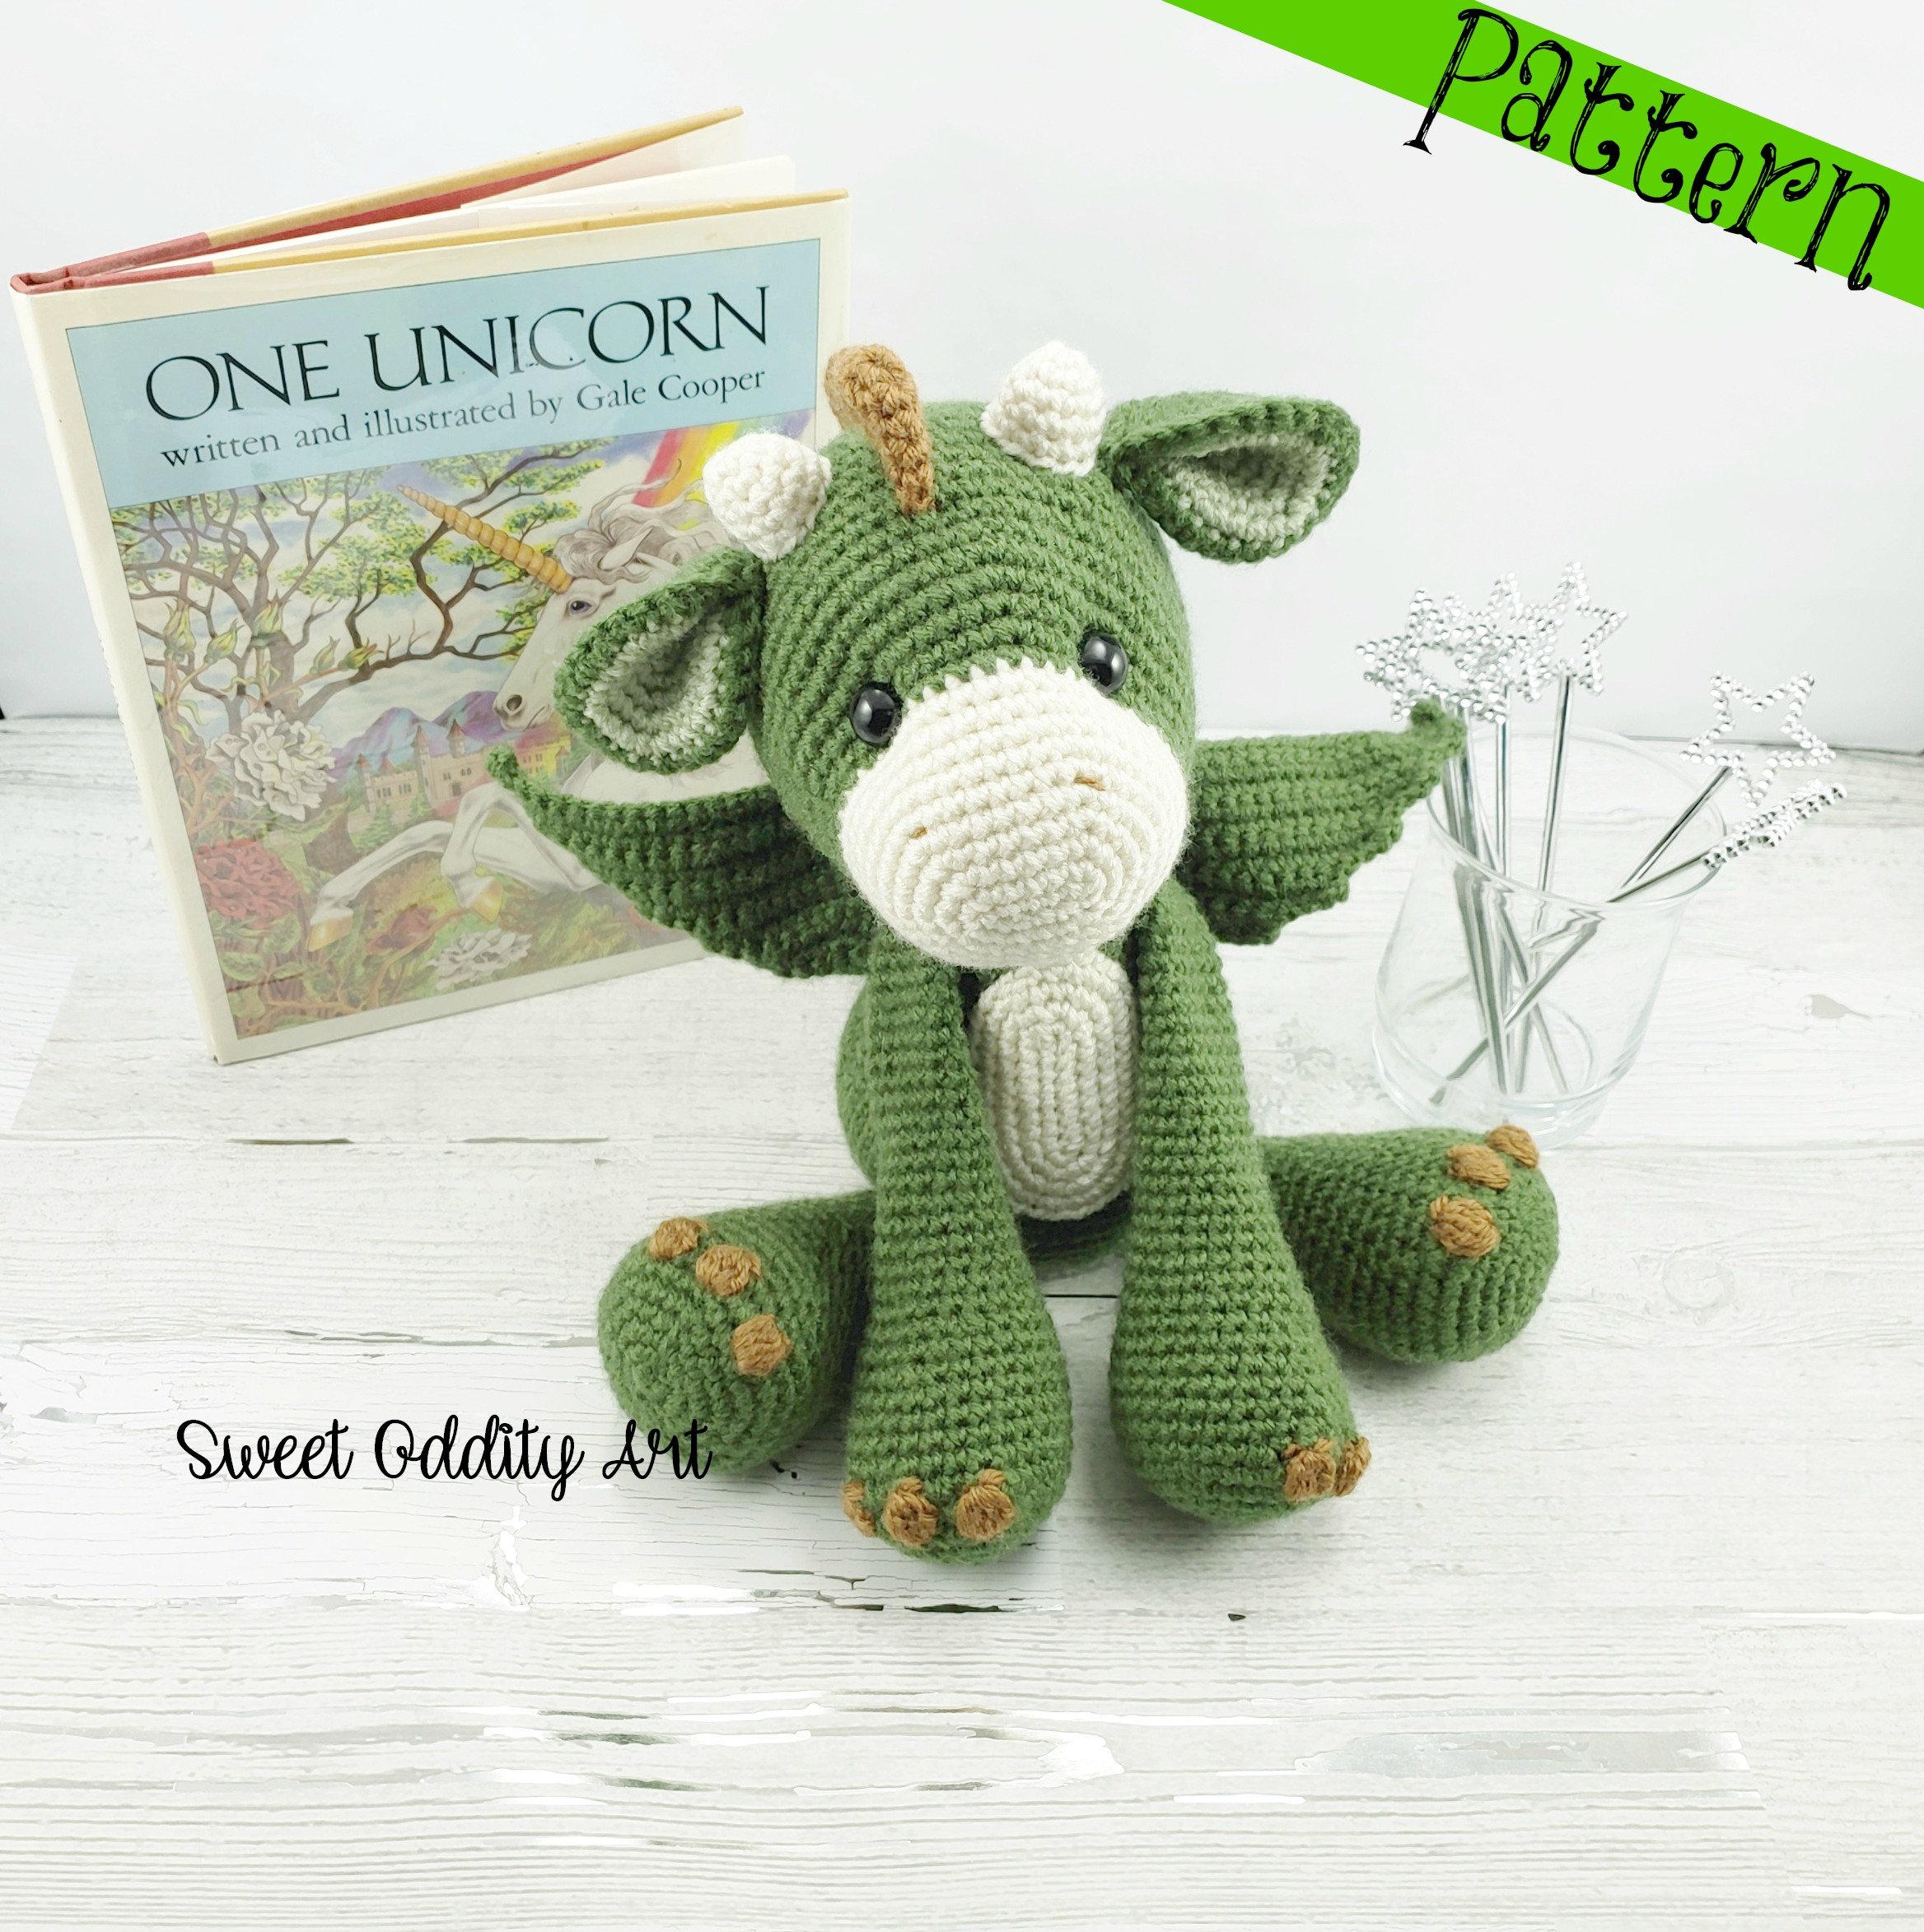 dragon crochet pattern | Etsy - photo#21